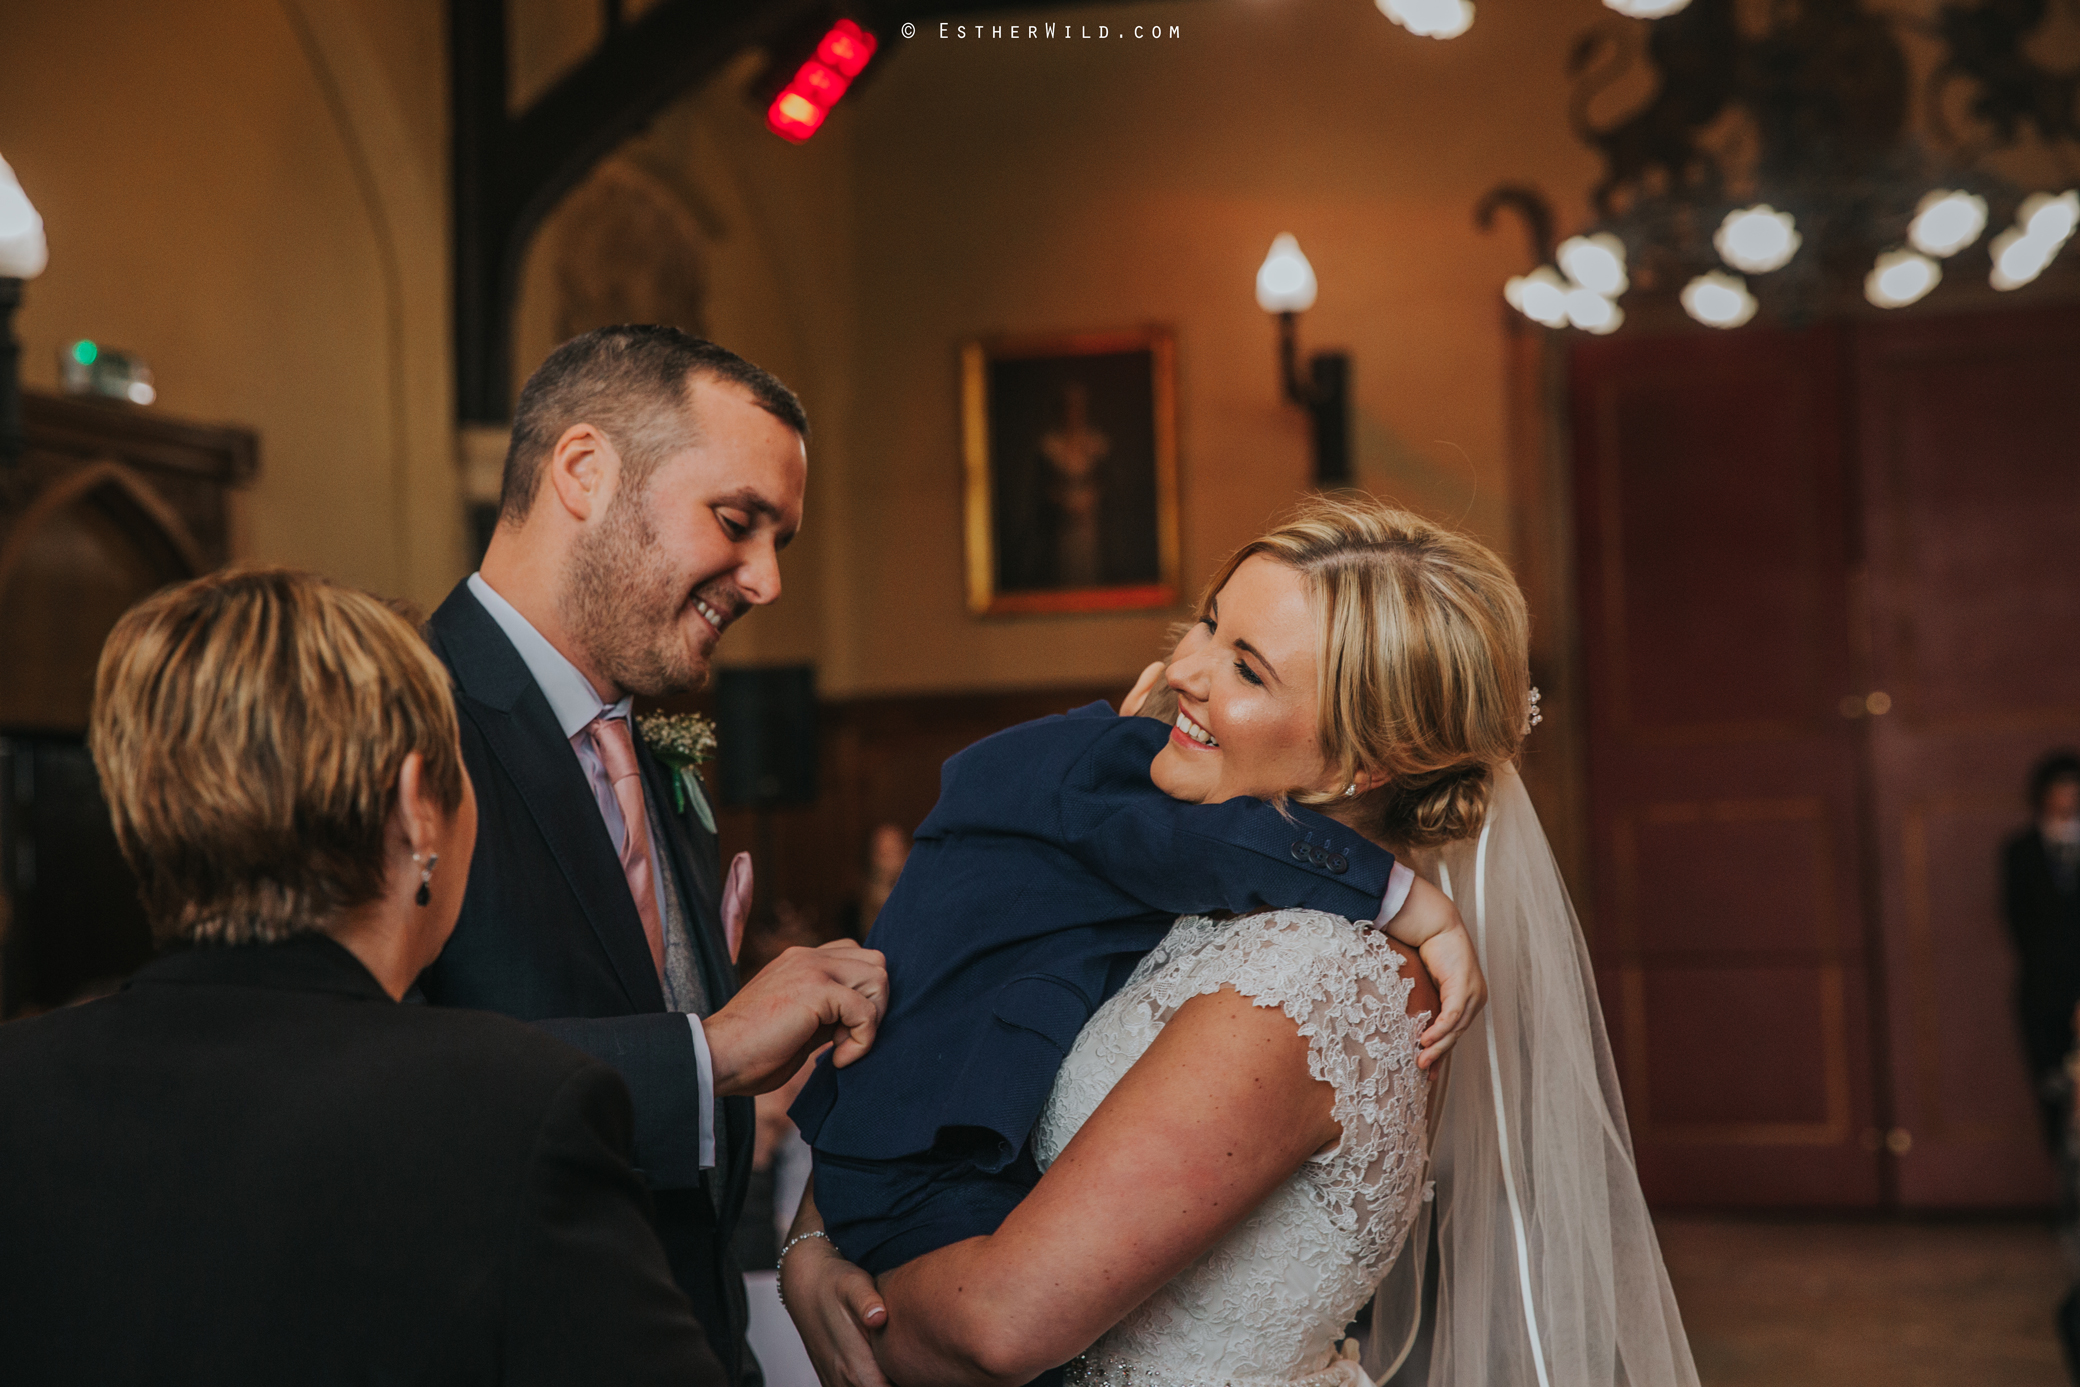 Wedding_Kings_Lynn_Town_Hall_Norfolk_Photographer_Esther_Wild_IMG_1062.jpg